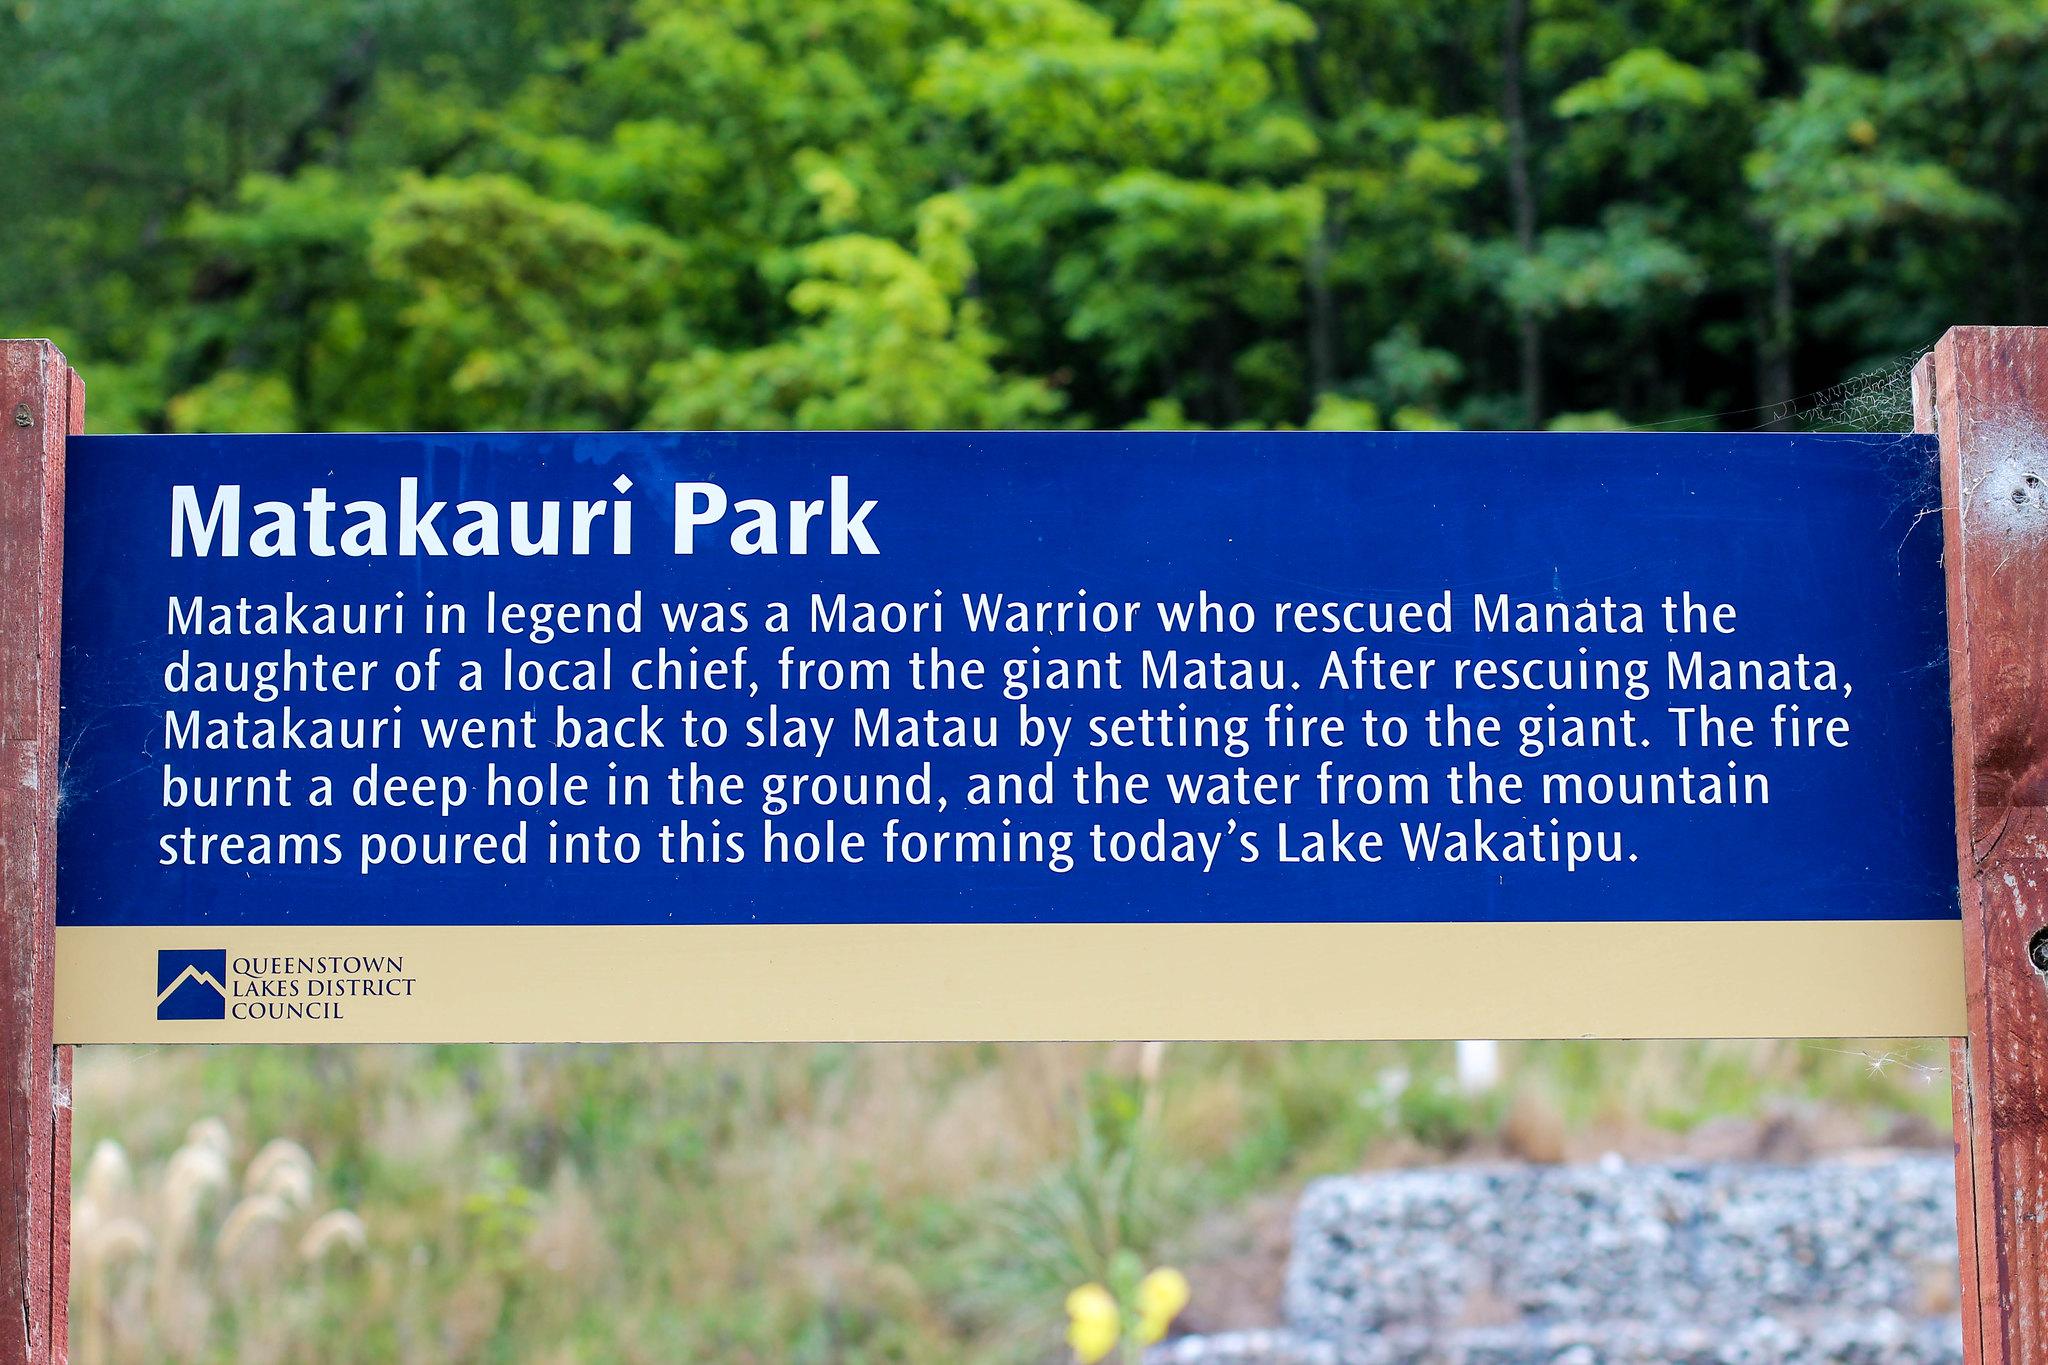 Matakauri Park